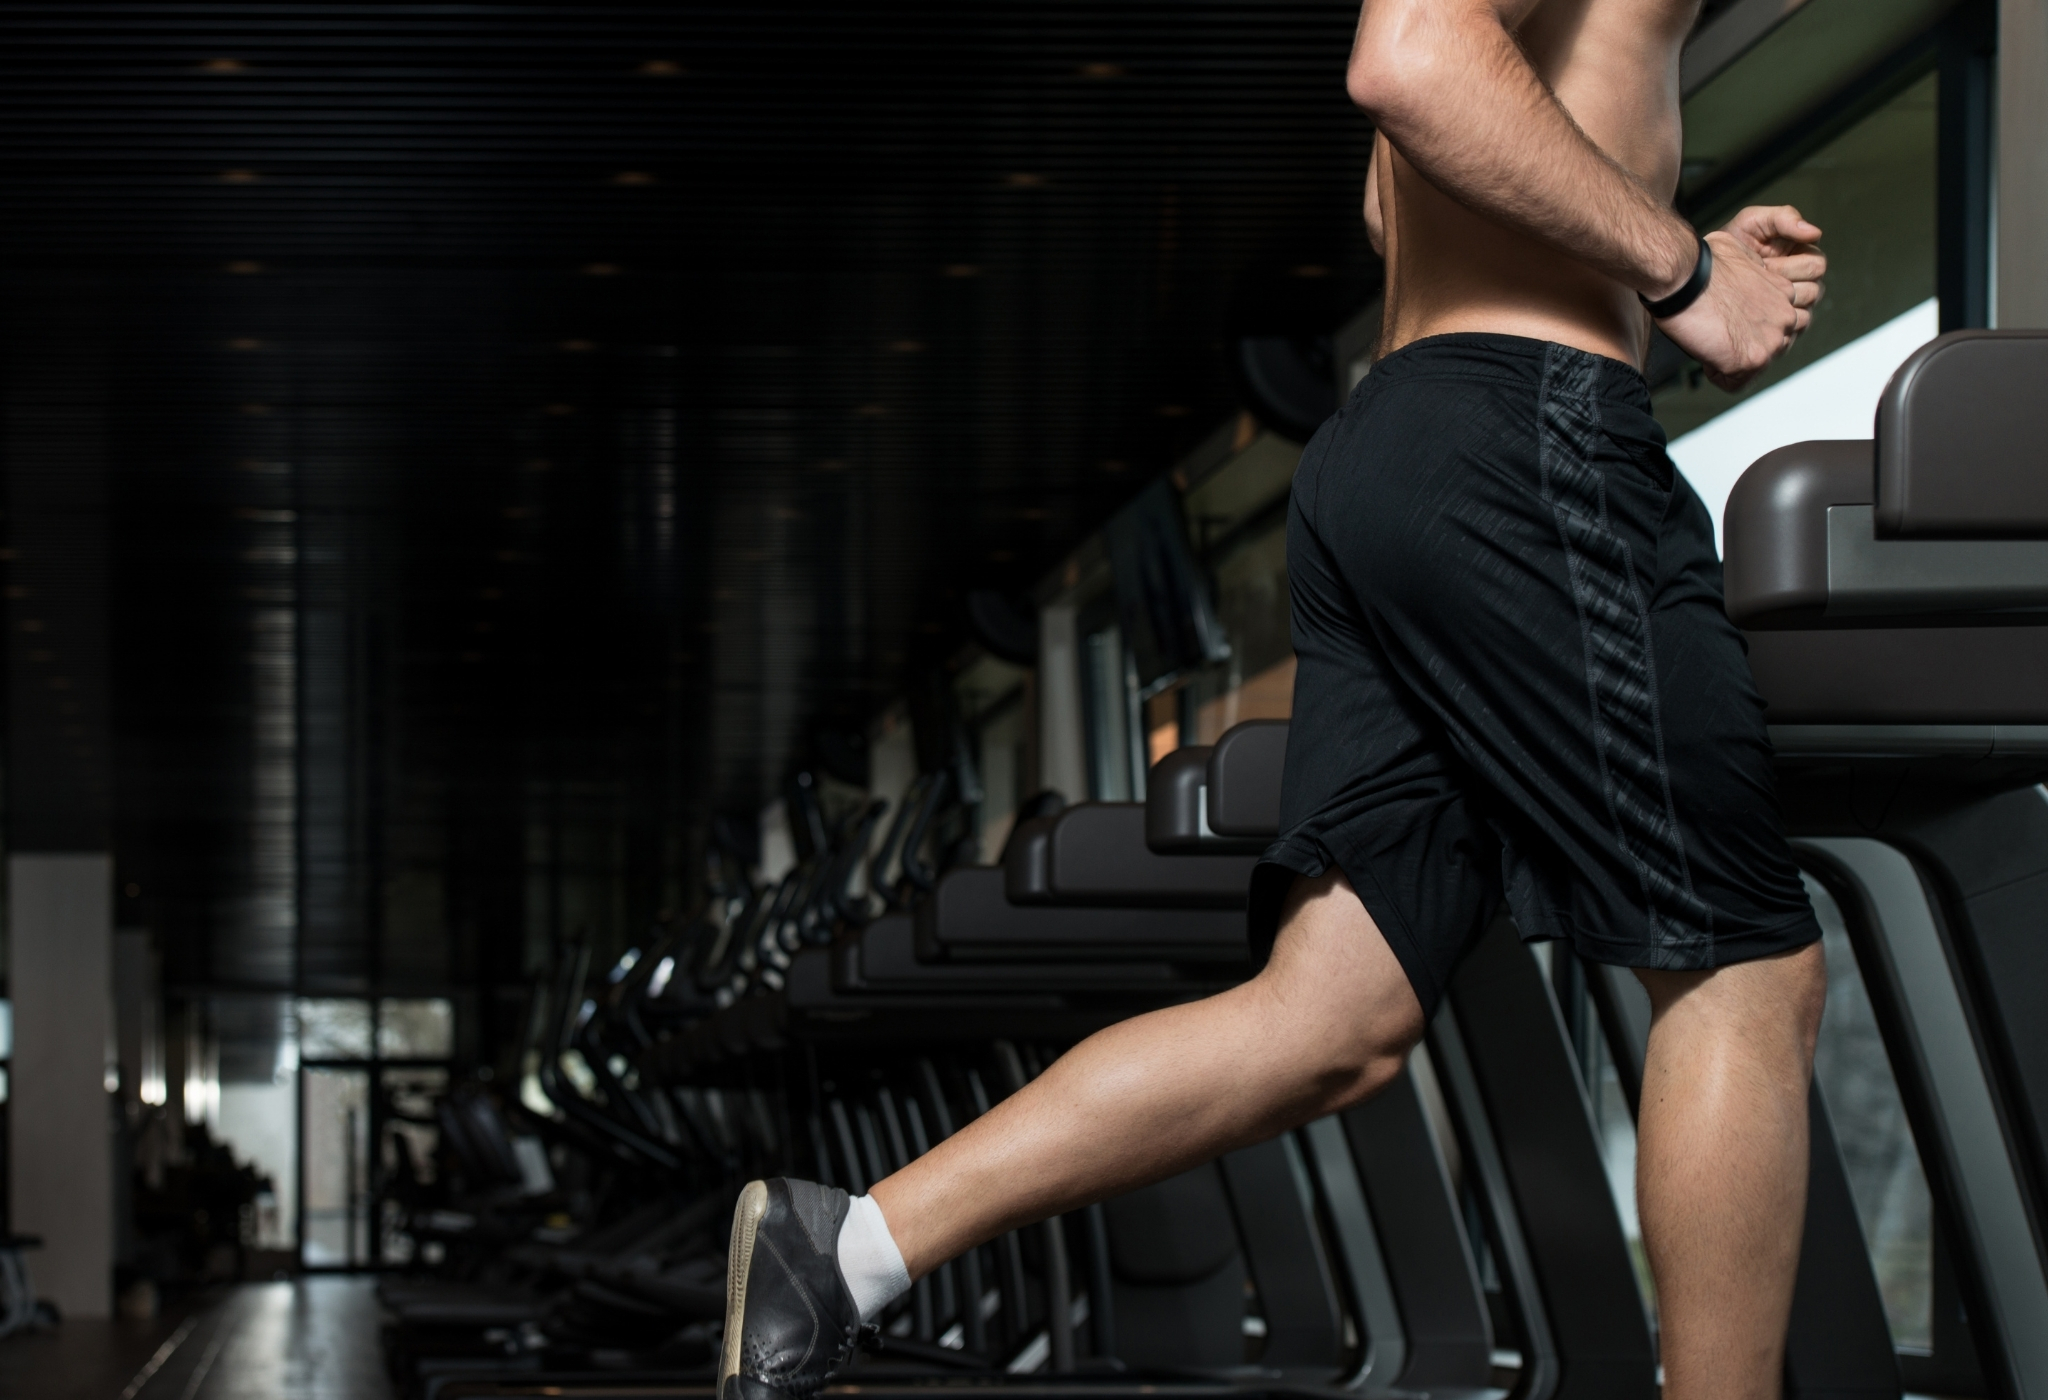 man wearing shorts at the gym